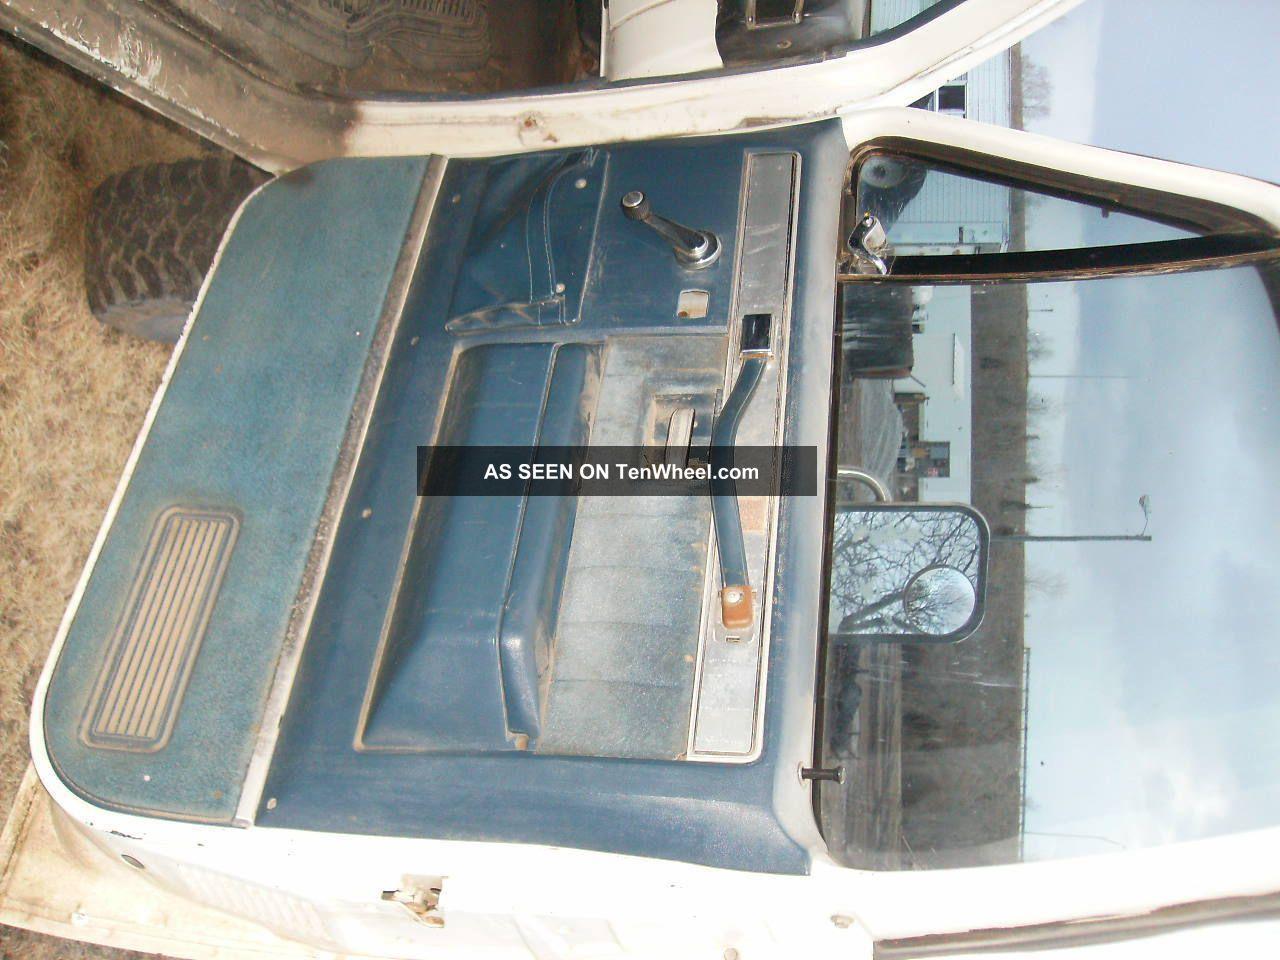 Huge 1977 Lifted 1 Ton Chevy Crew Cab Dually 4x4 Long Box